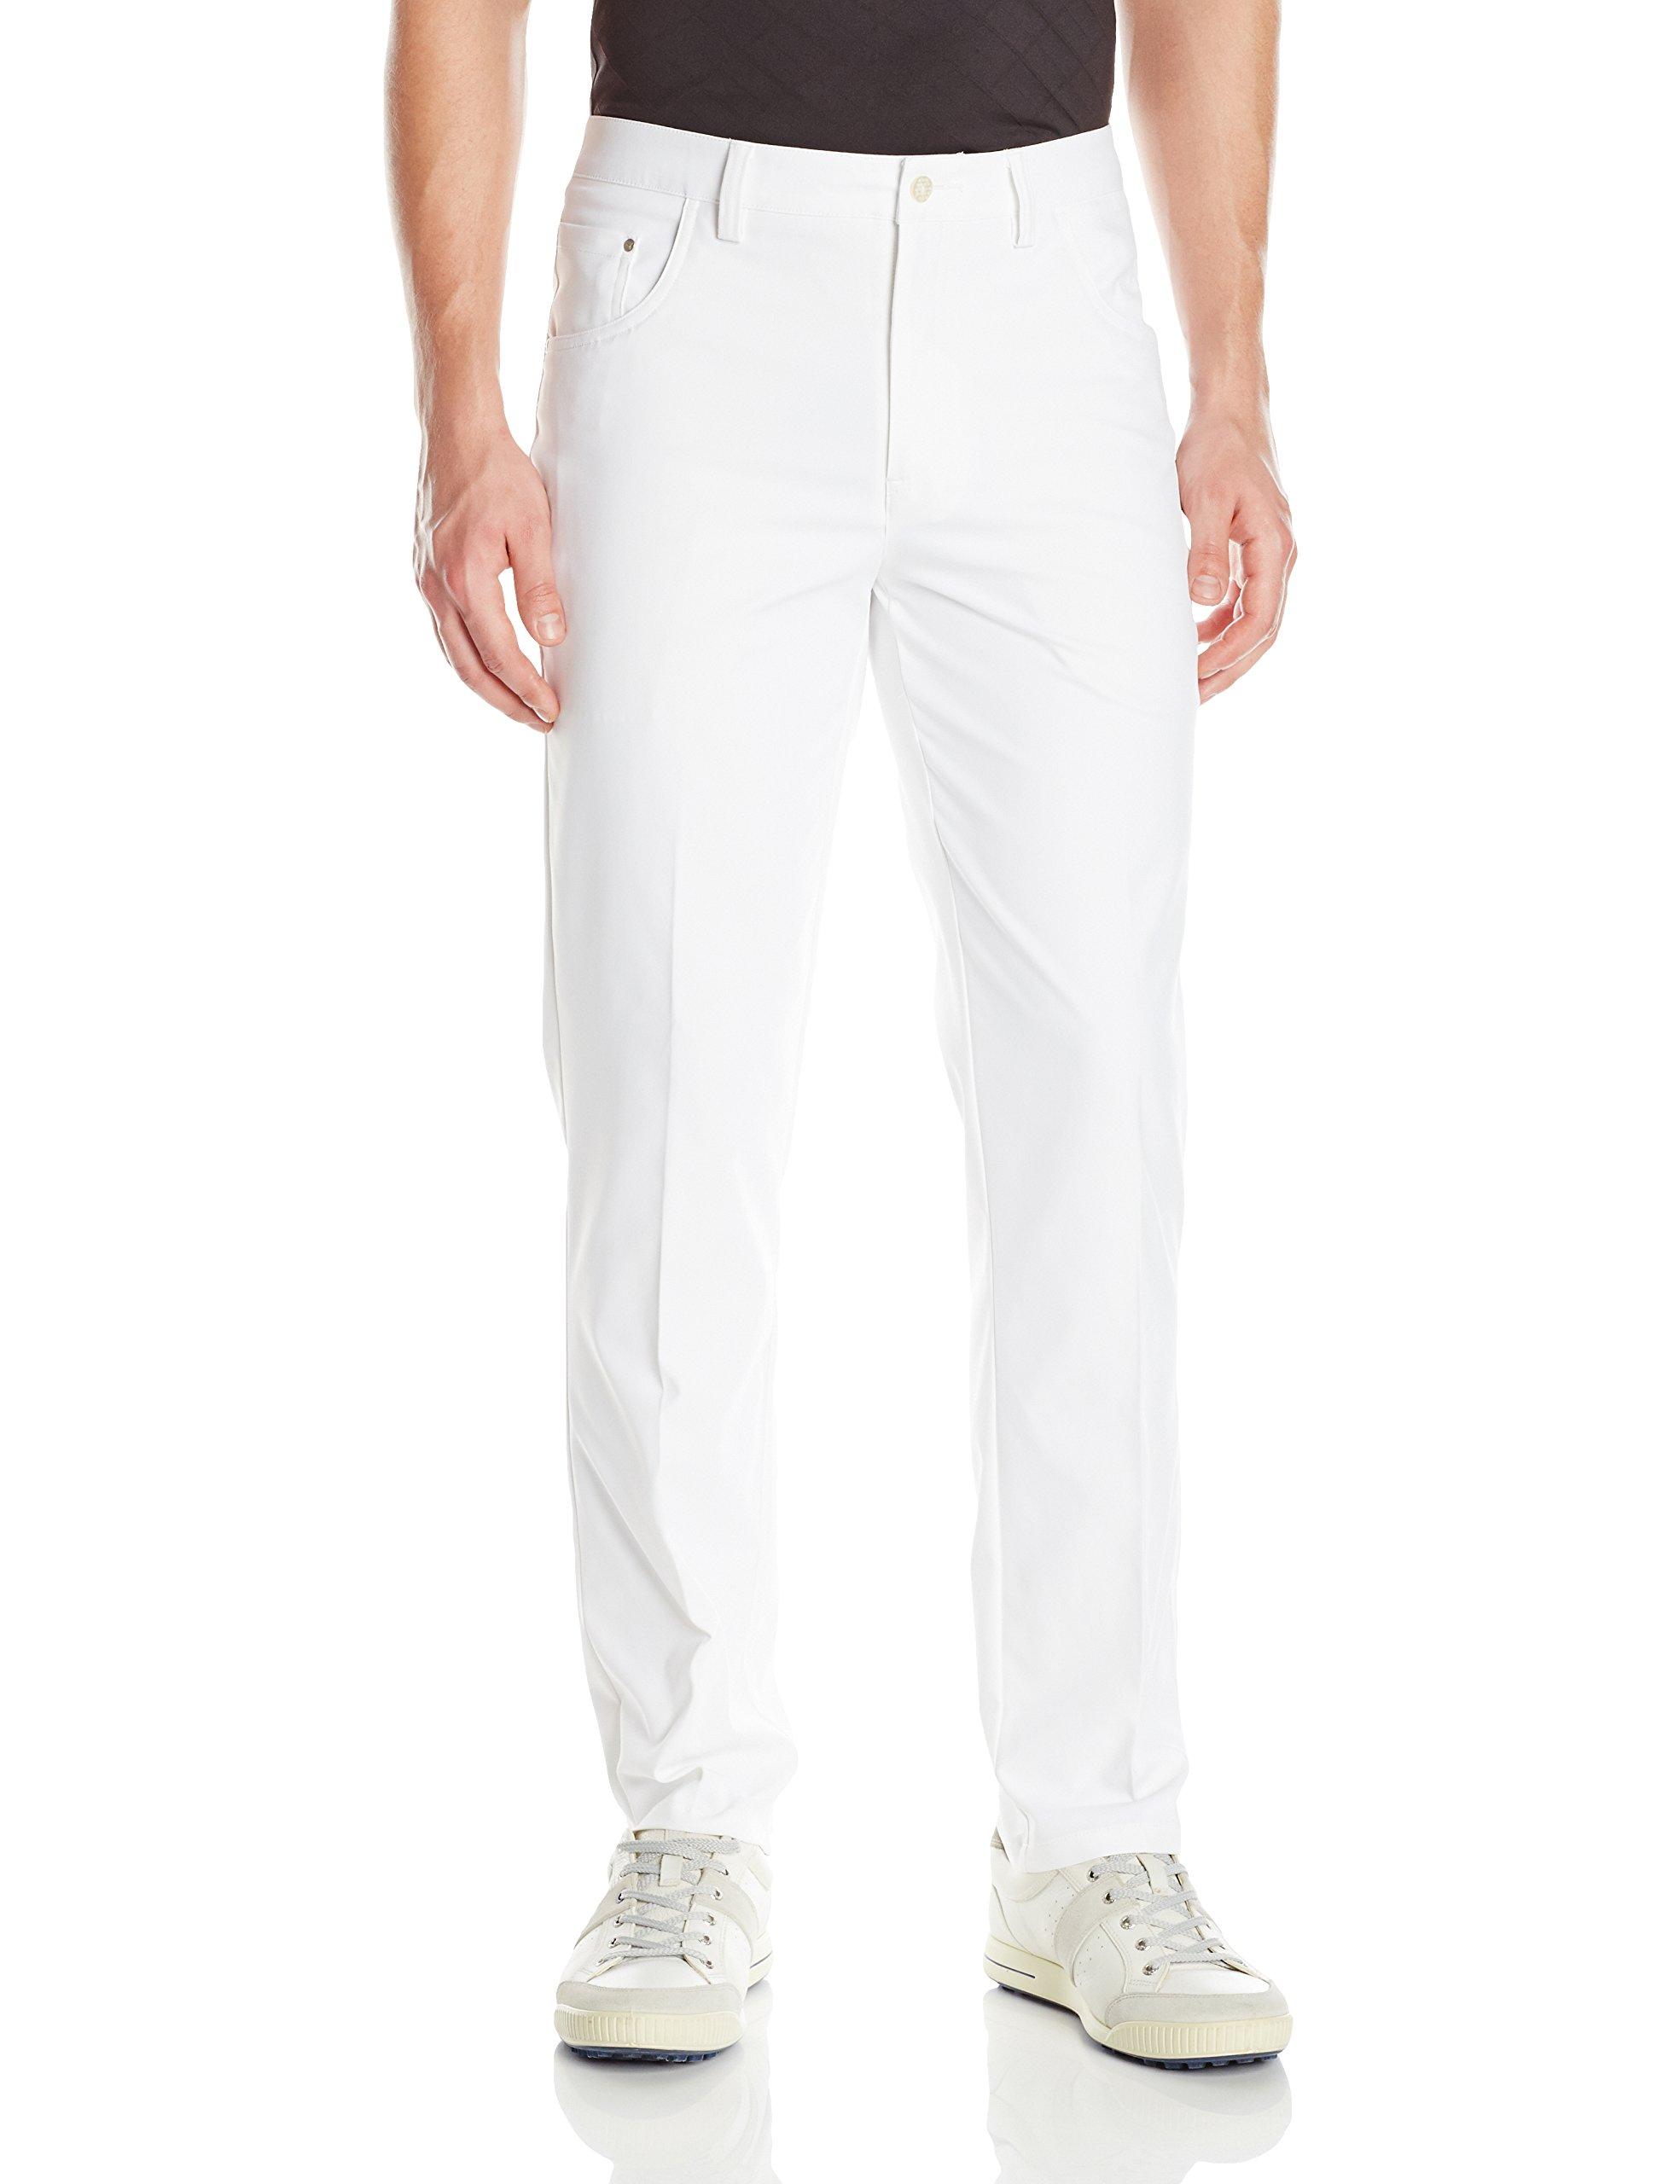 PUMA Golf 2017 Men's 6 Pocket Pants, Bright White, 36x34 by PUMA